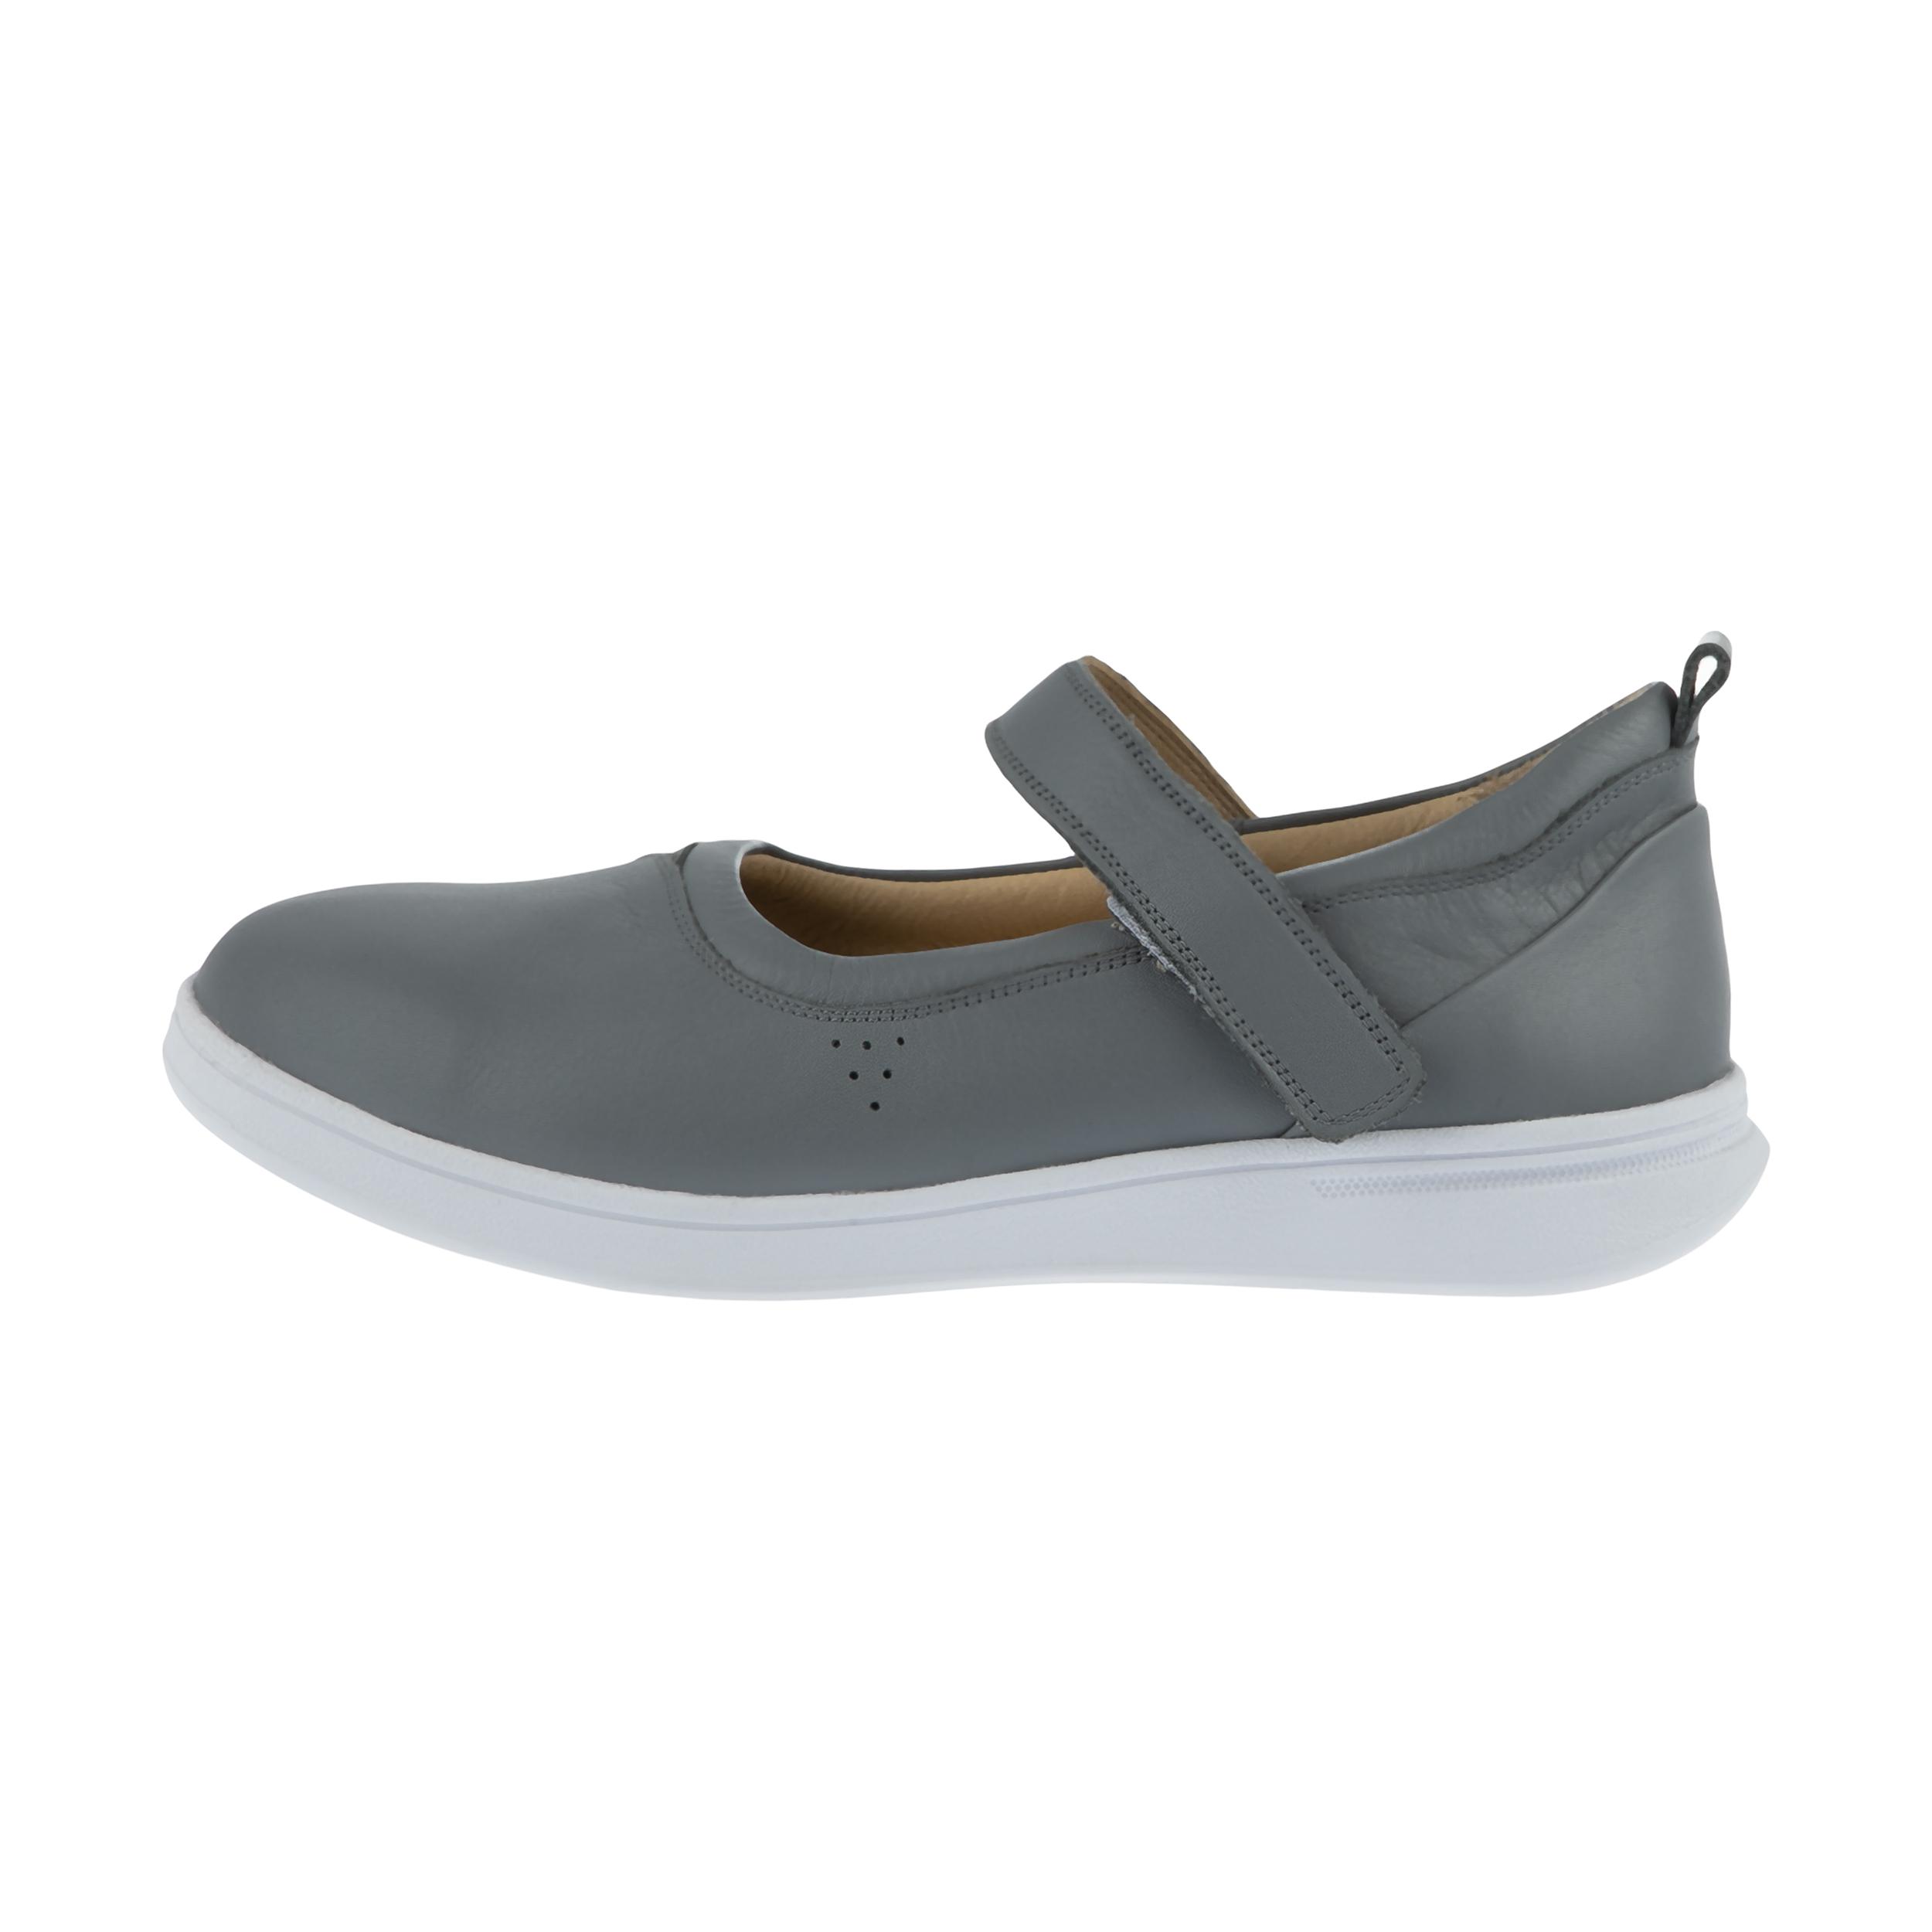 کفش روزمره زنانه برتونیکس مدل 920-B-20